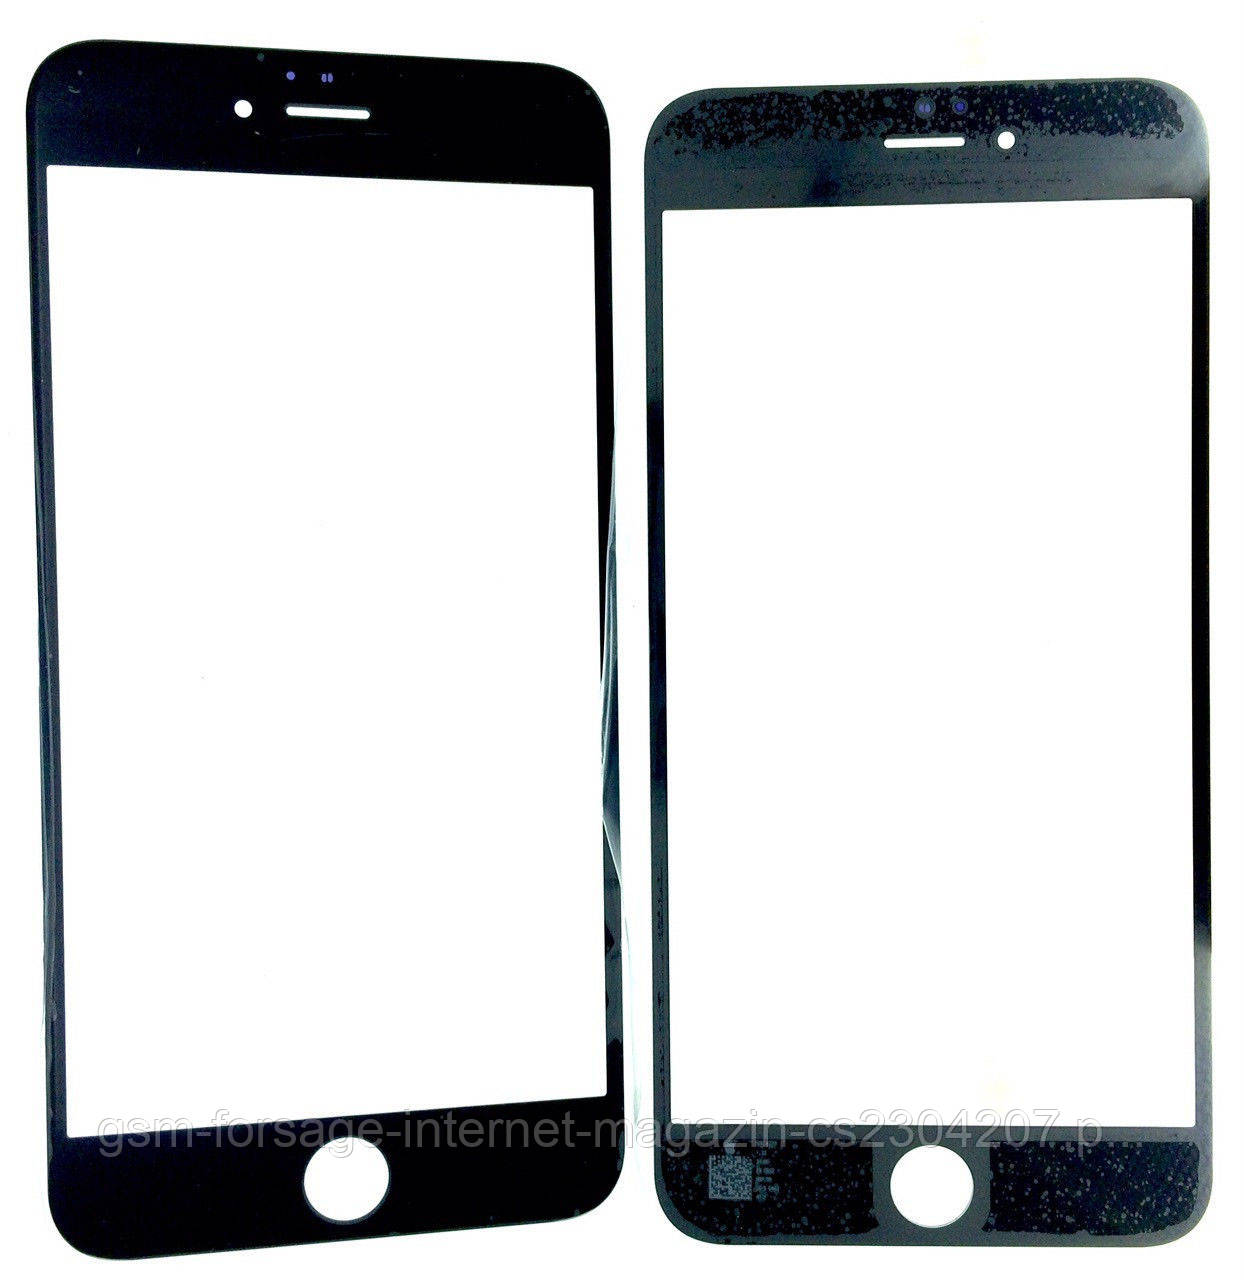 "Стекло дисплея iPhone 6S Plus (5.5"") Black (для переклейки)"